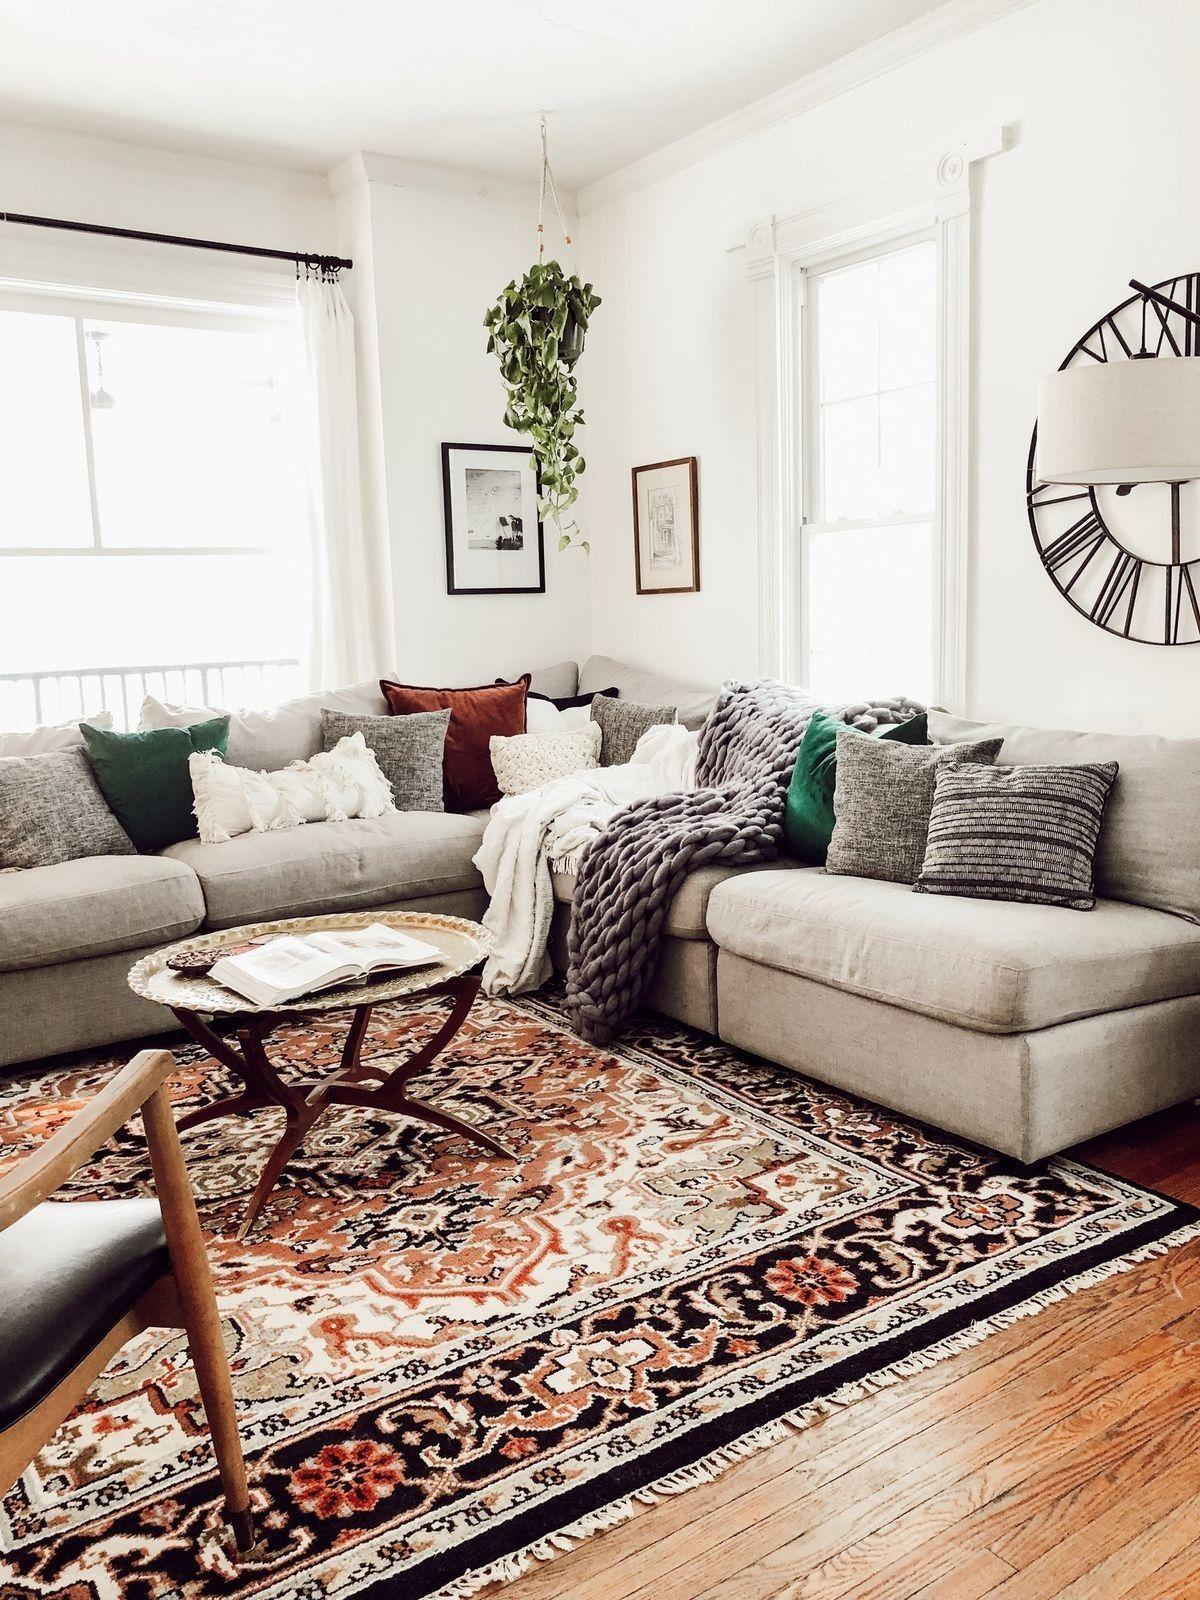 Pinterest Rachelfowlie Cozy Home Decorating Eclectic Living Room Cozy Eclectic Living Room